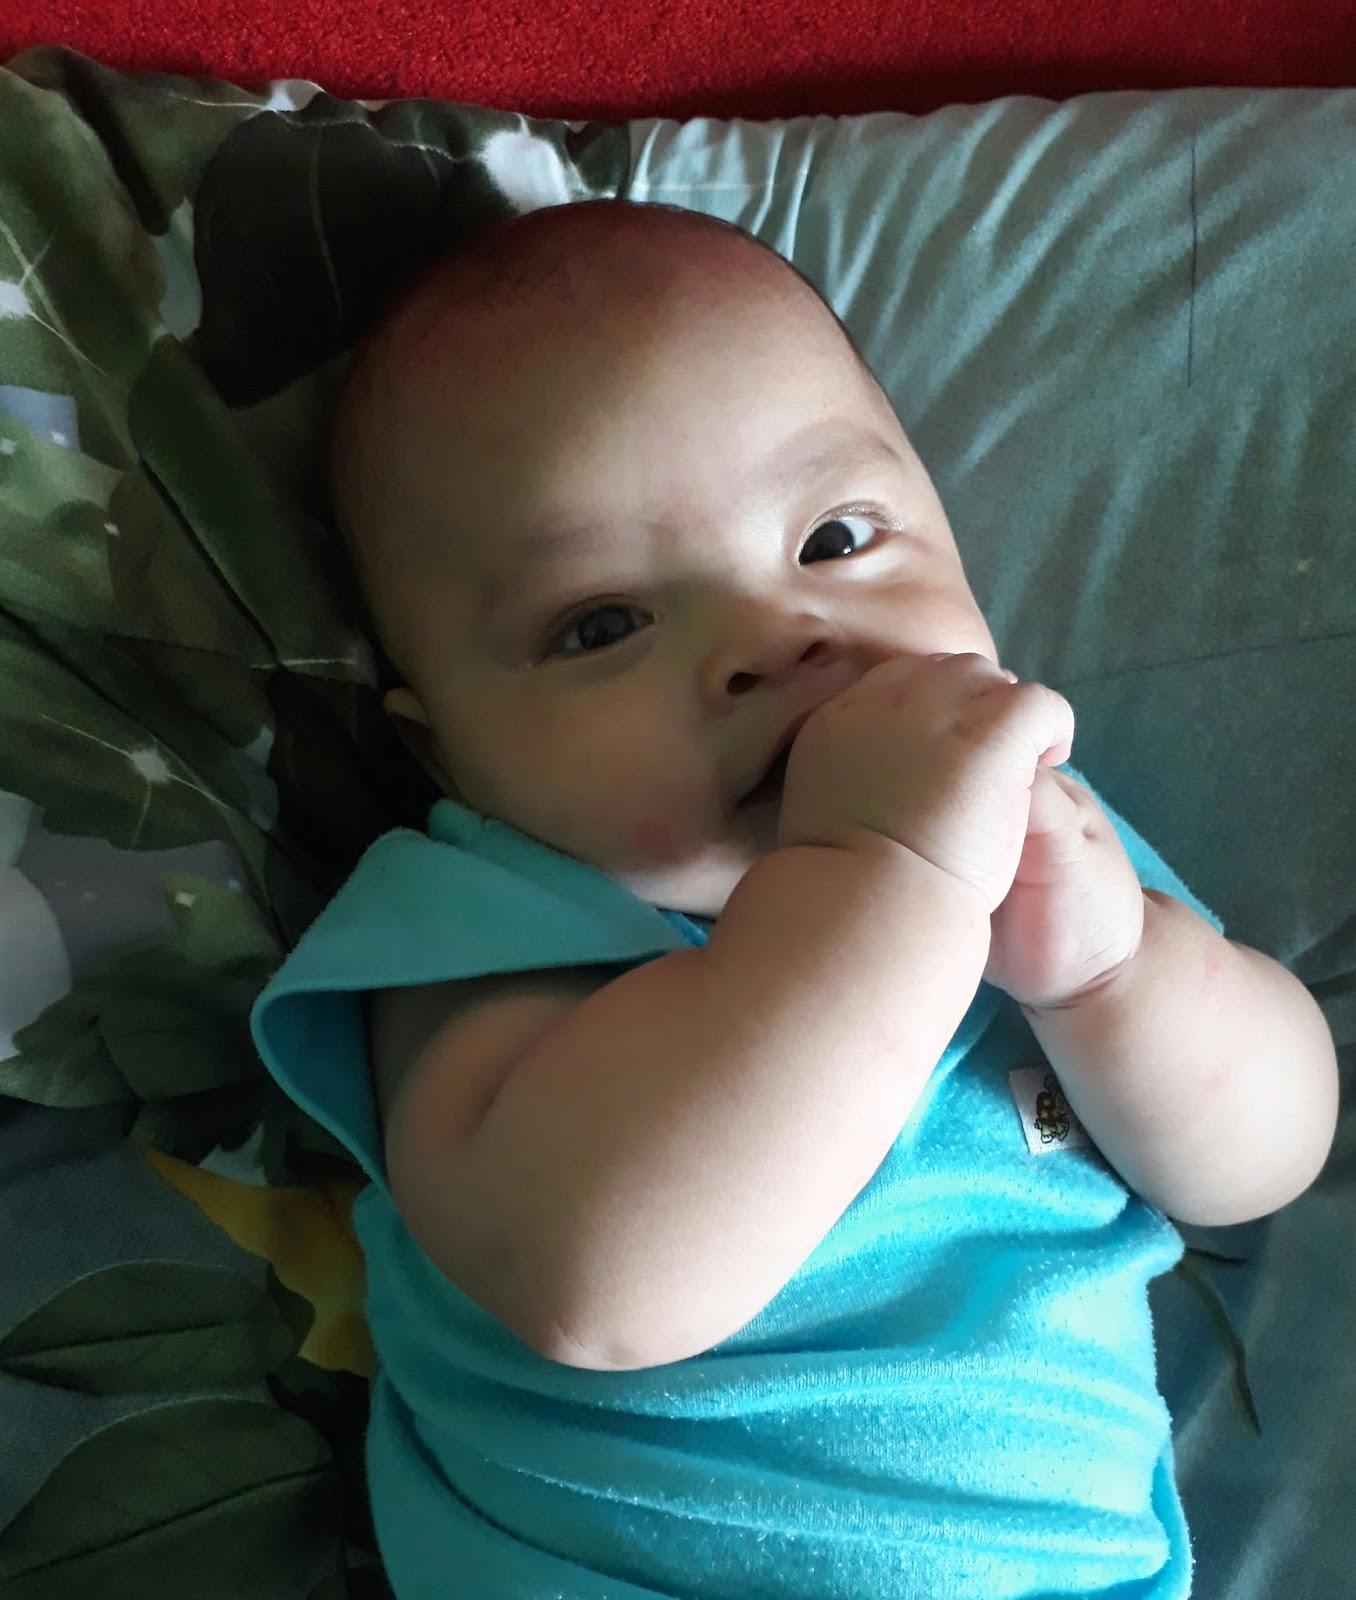 Rey Sha S Mom S Stories 10 Tanda Tanda Bayi Akan Tumbuh Gigi